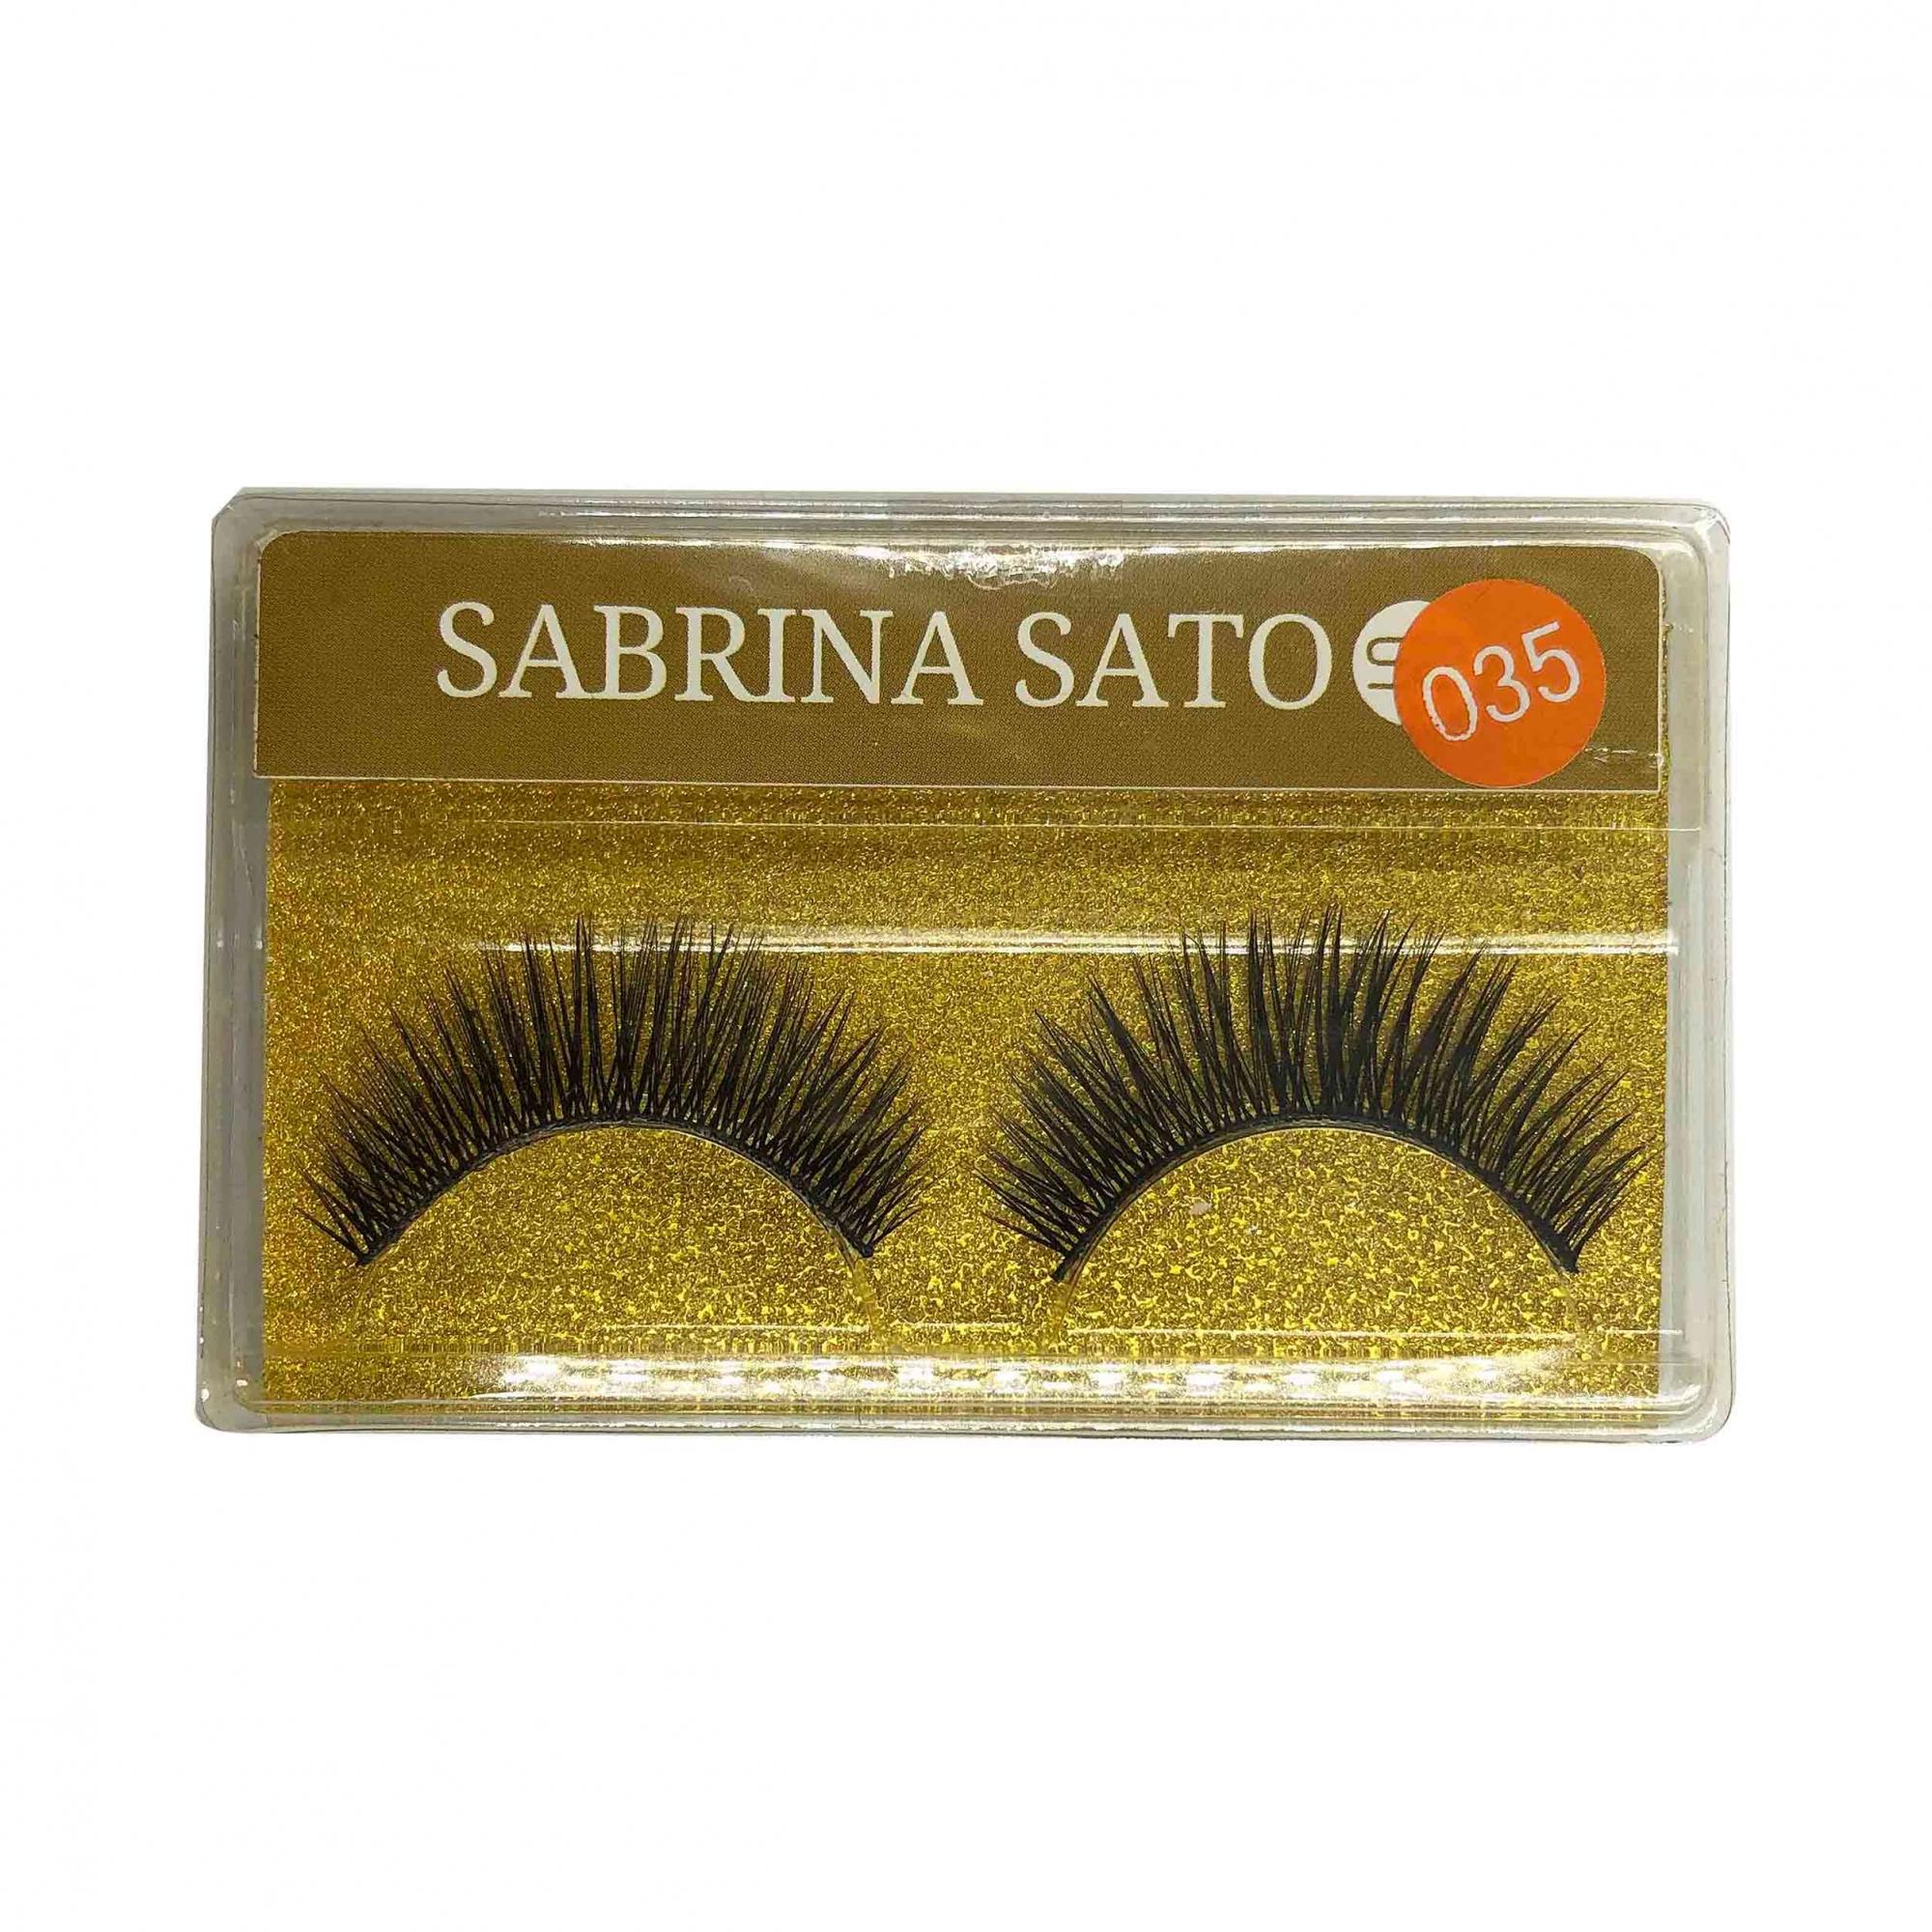 Sabrina Sato Cílios Postiços 035